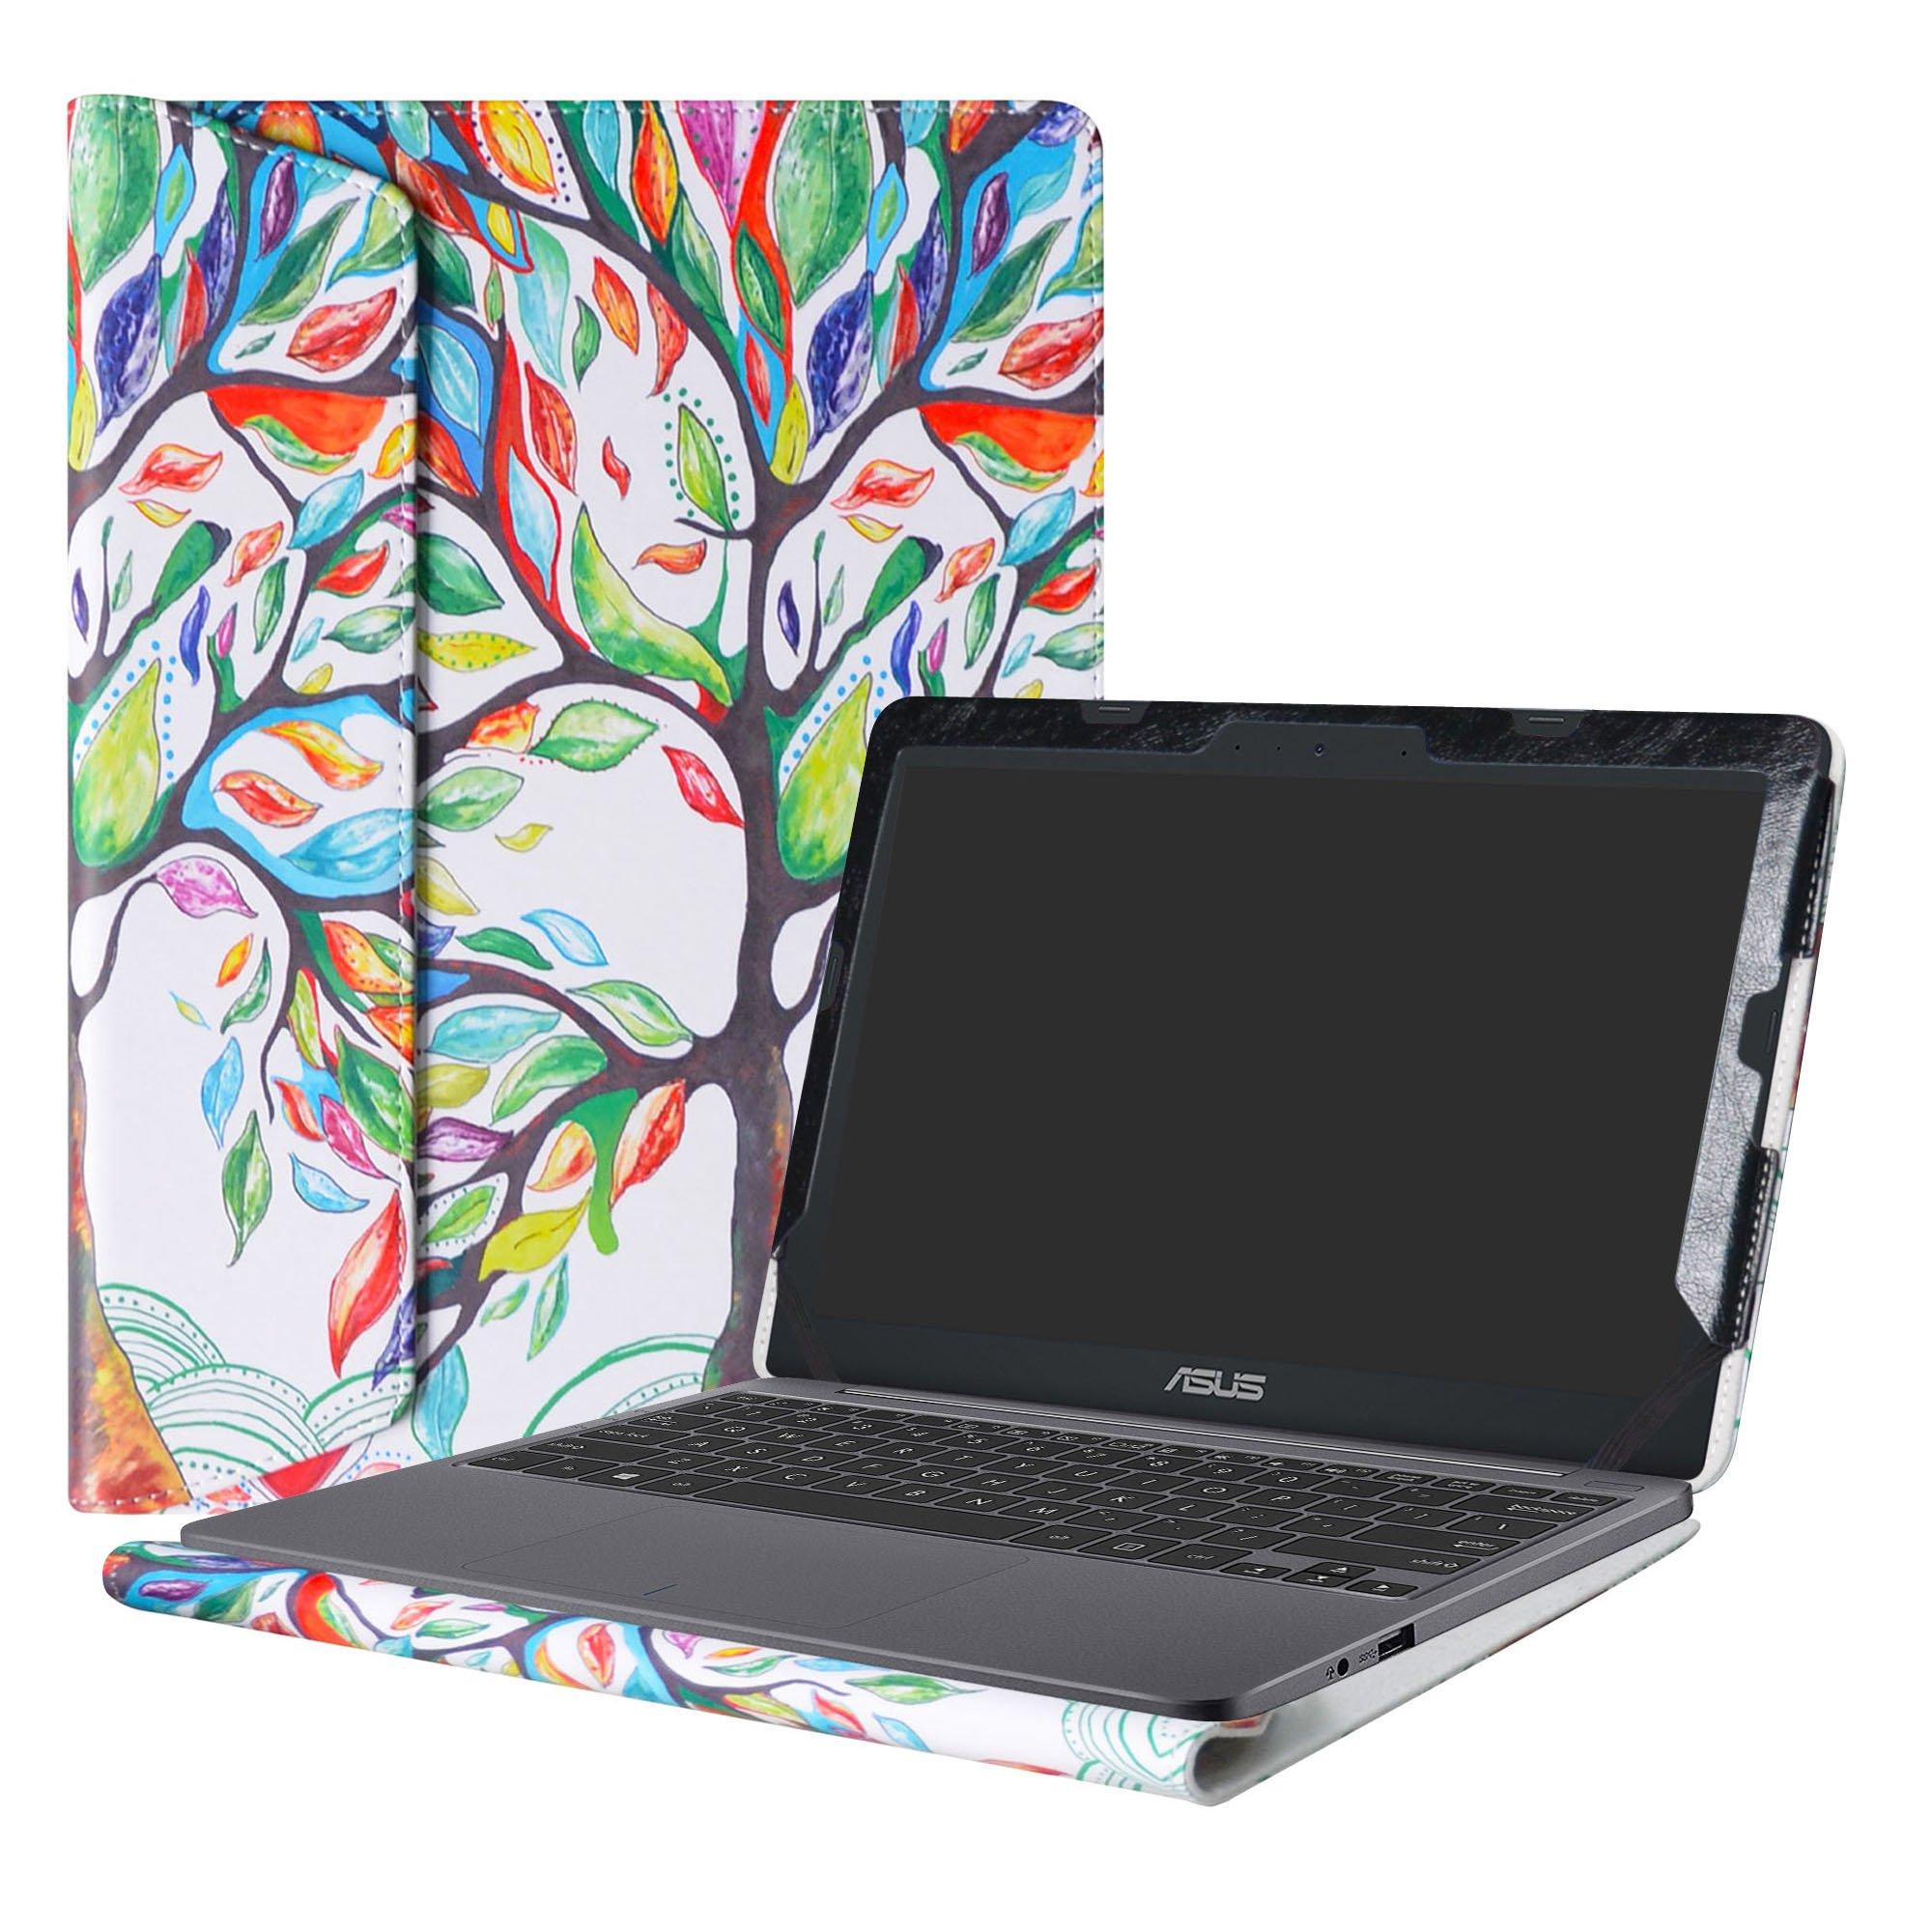 Alapmk Protective Case Cover For 11.6'' ASUS VivoBook E203NA E200HA L200HA/Chromebook C201 C201PA Series Laptop(Warning:Only fit model E203NA E200HA L200HA C201PA),Love Tree